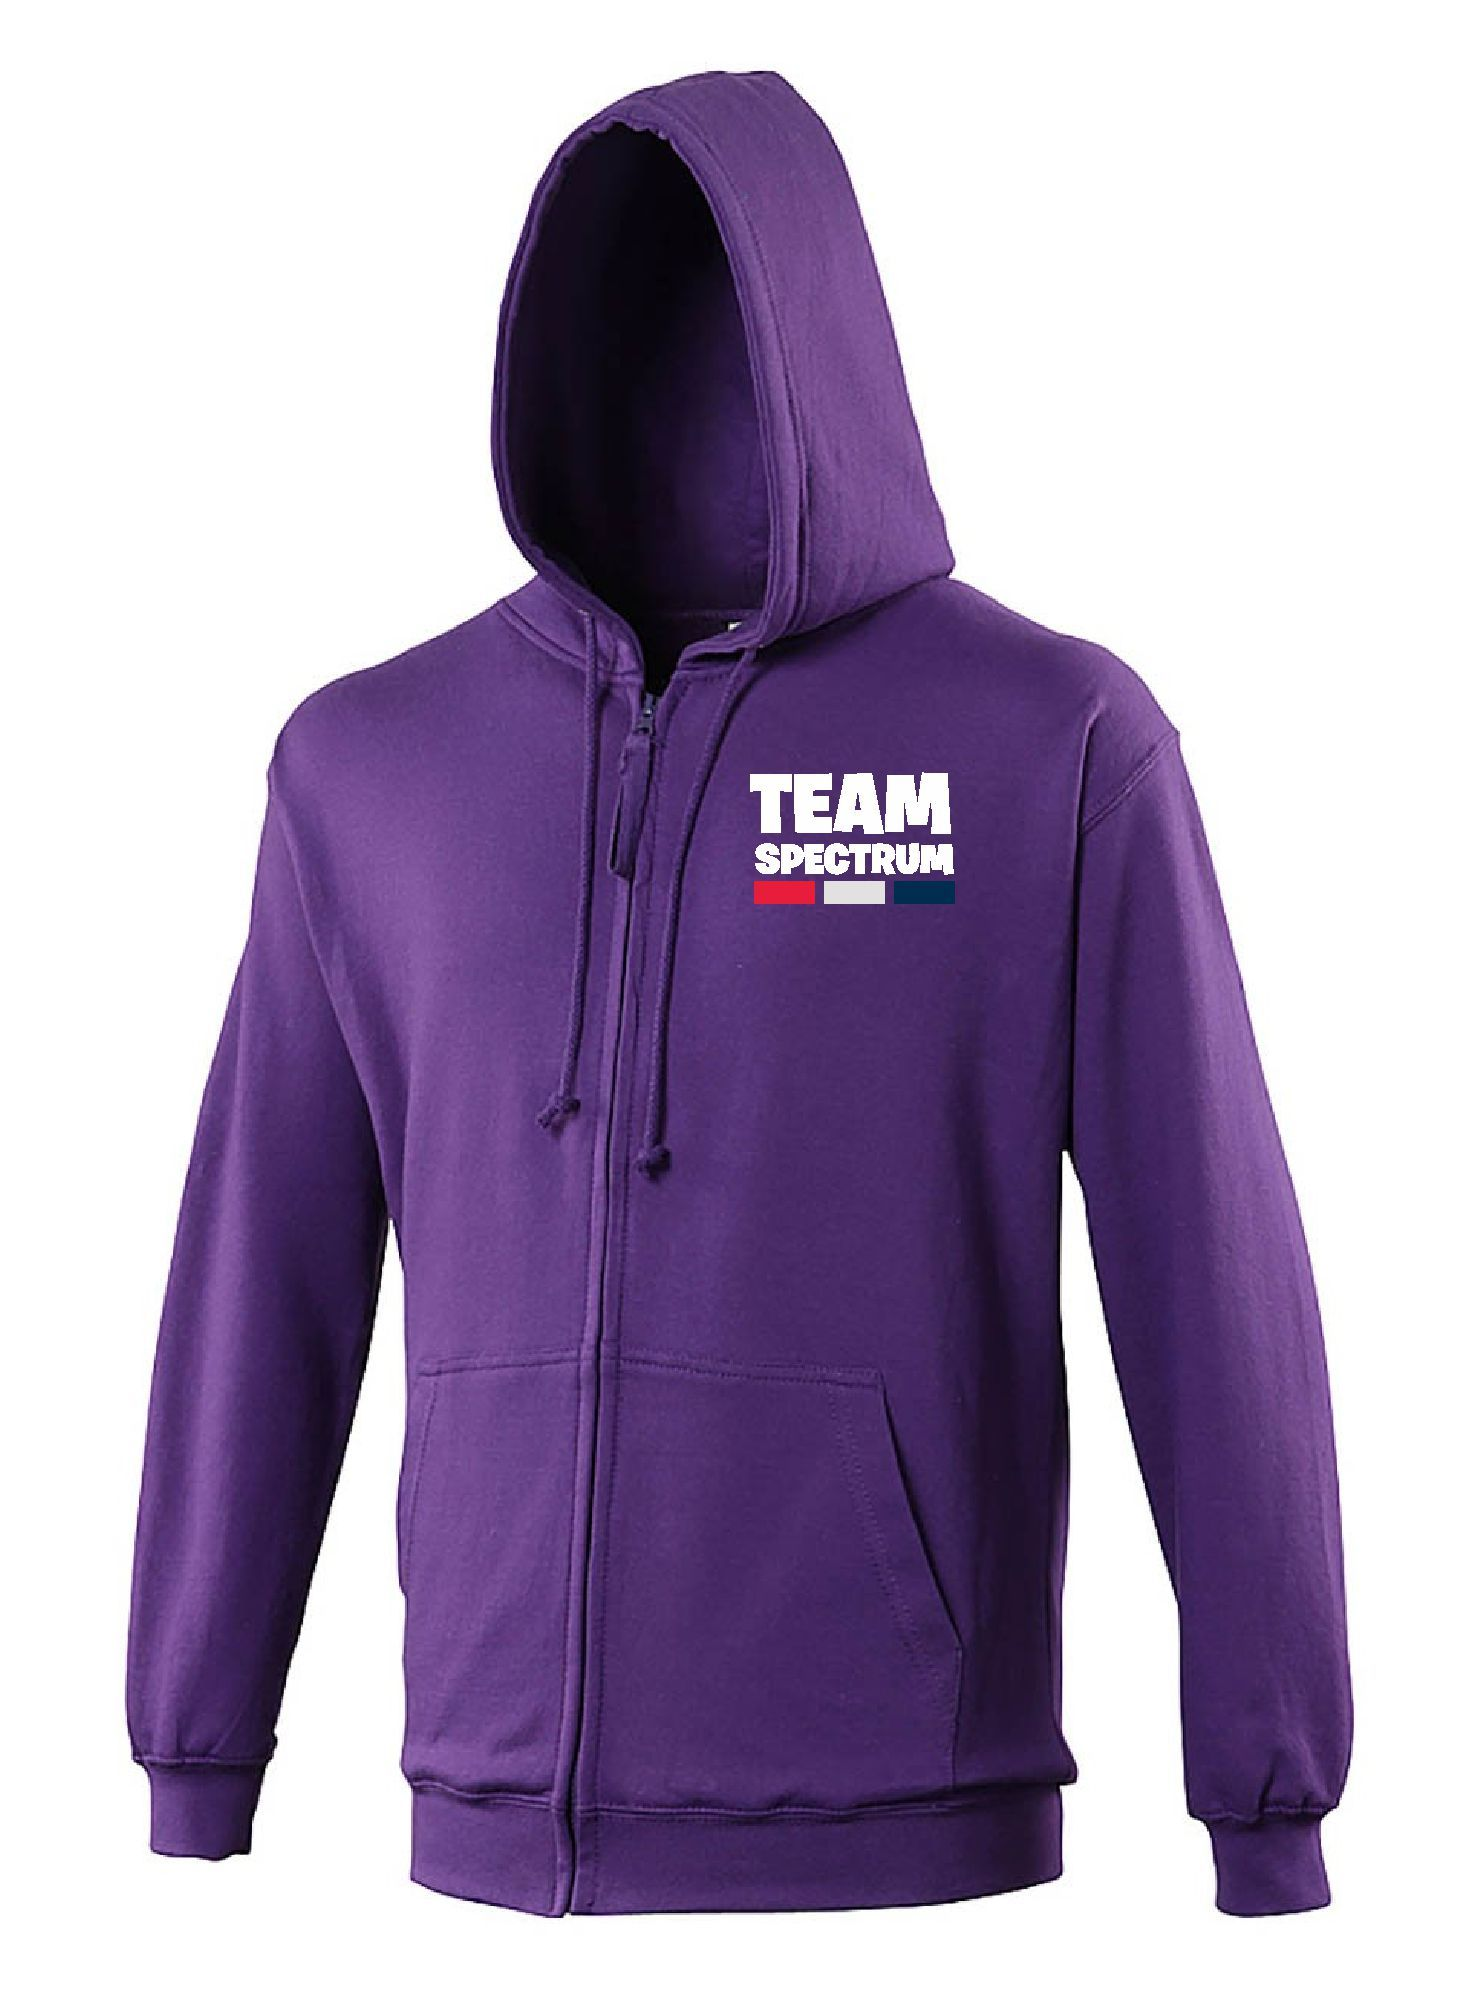 Team Spectrum - Zip Hoodie (Unisex)